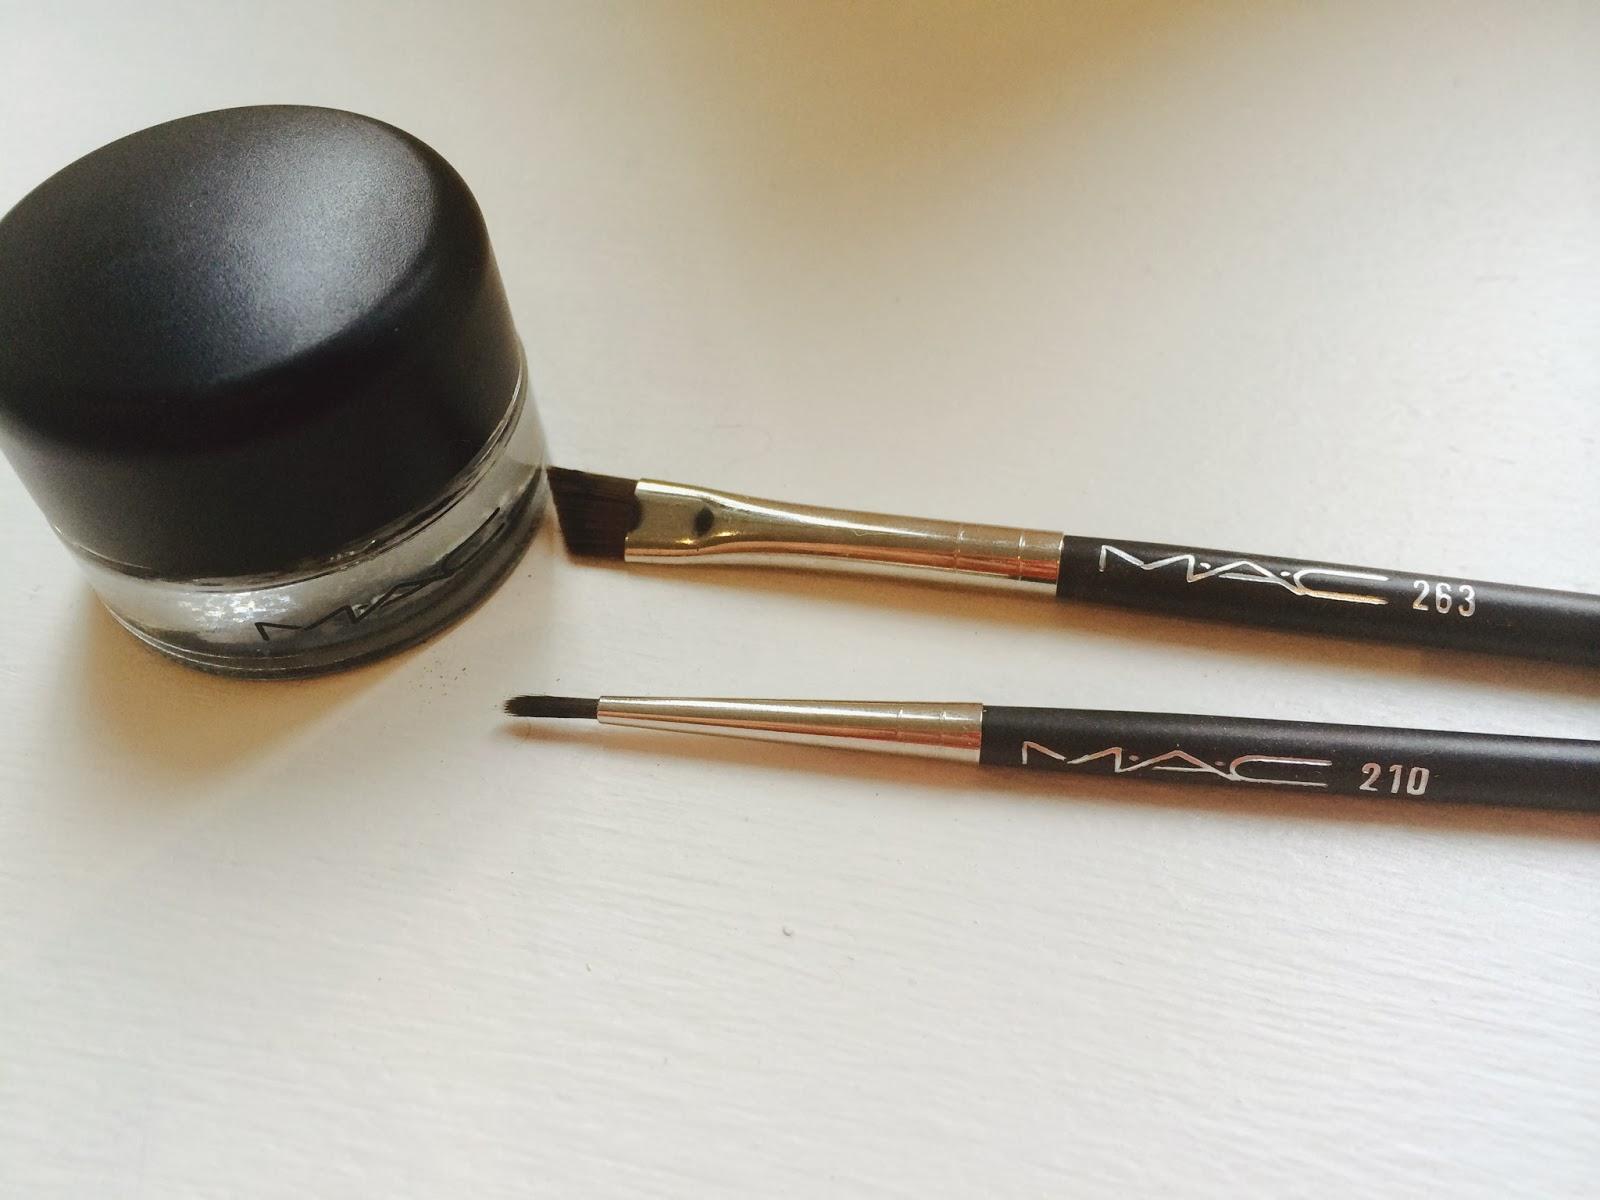 MAC Fuildline MAC 263 brush, MAC 210 brush